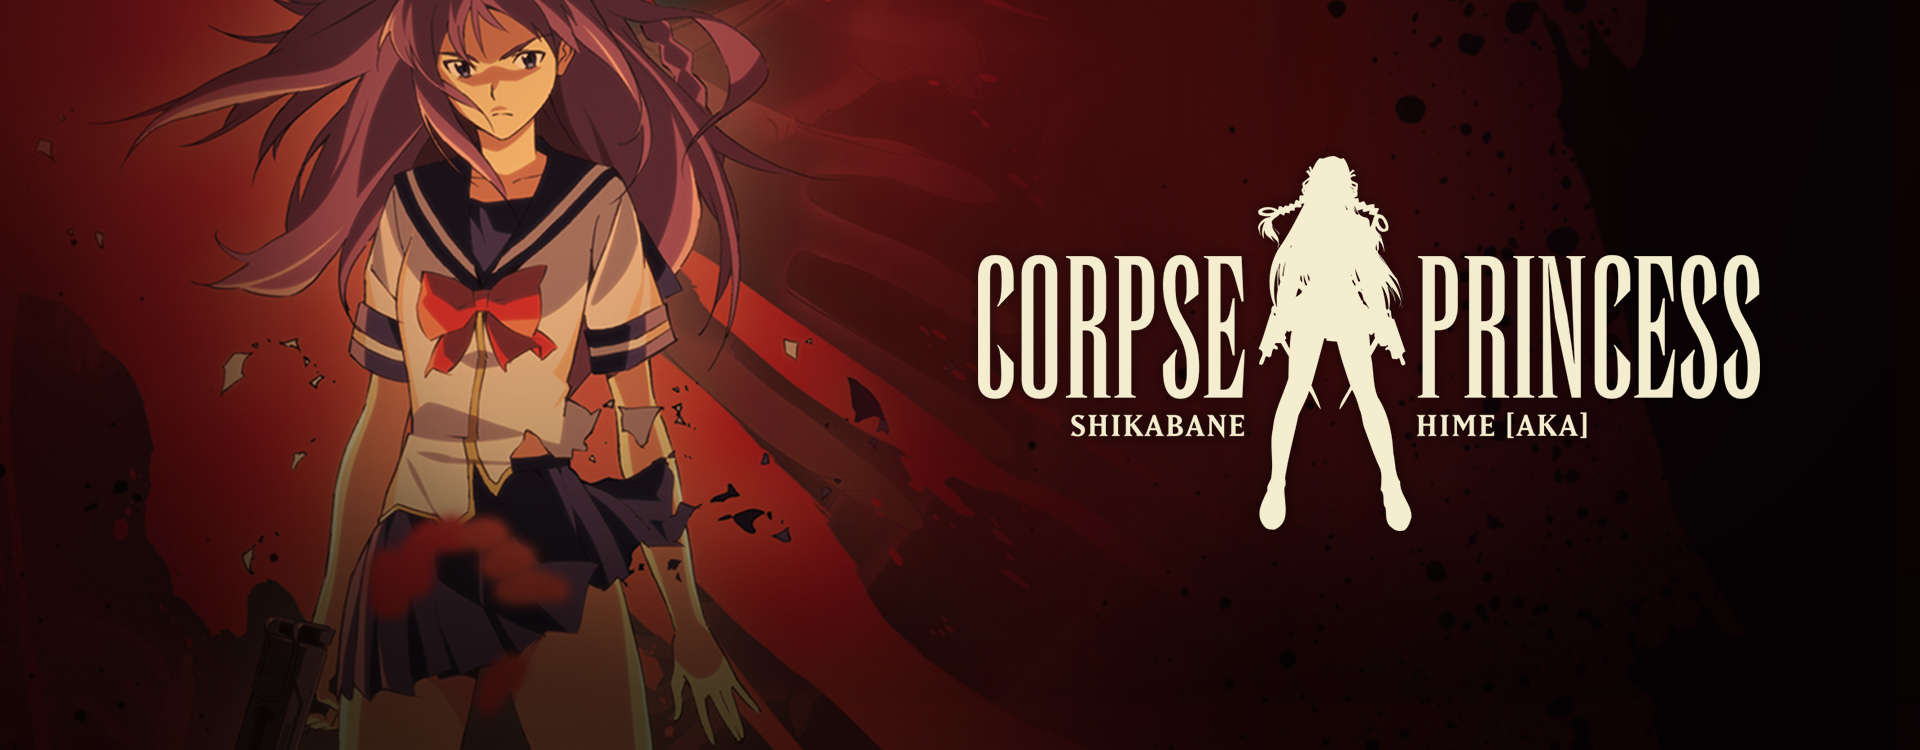 Corpse Princess: Shikabane Hime